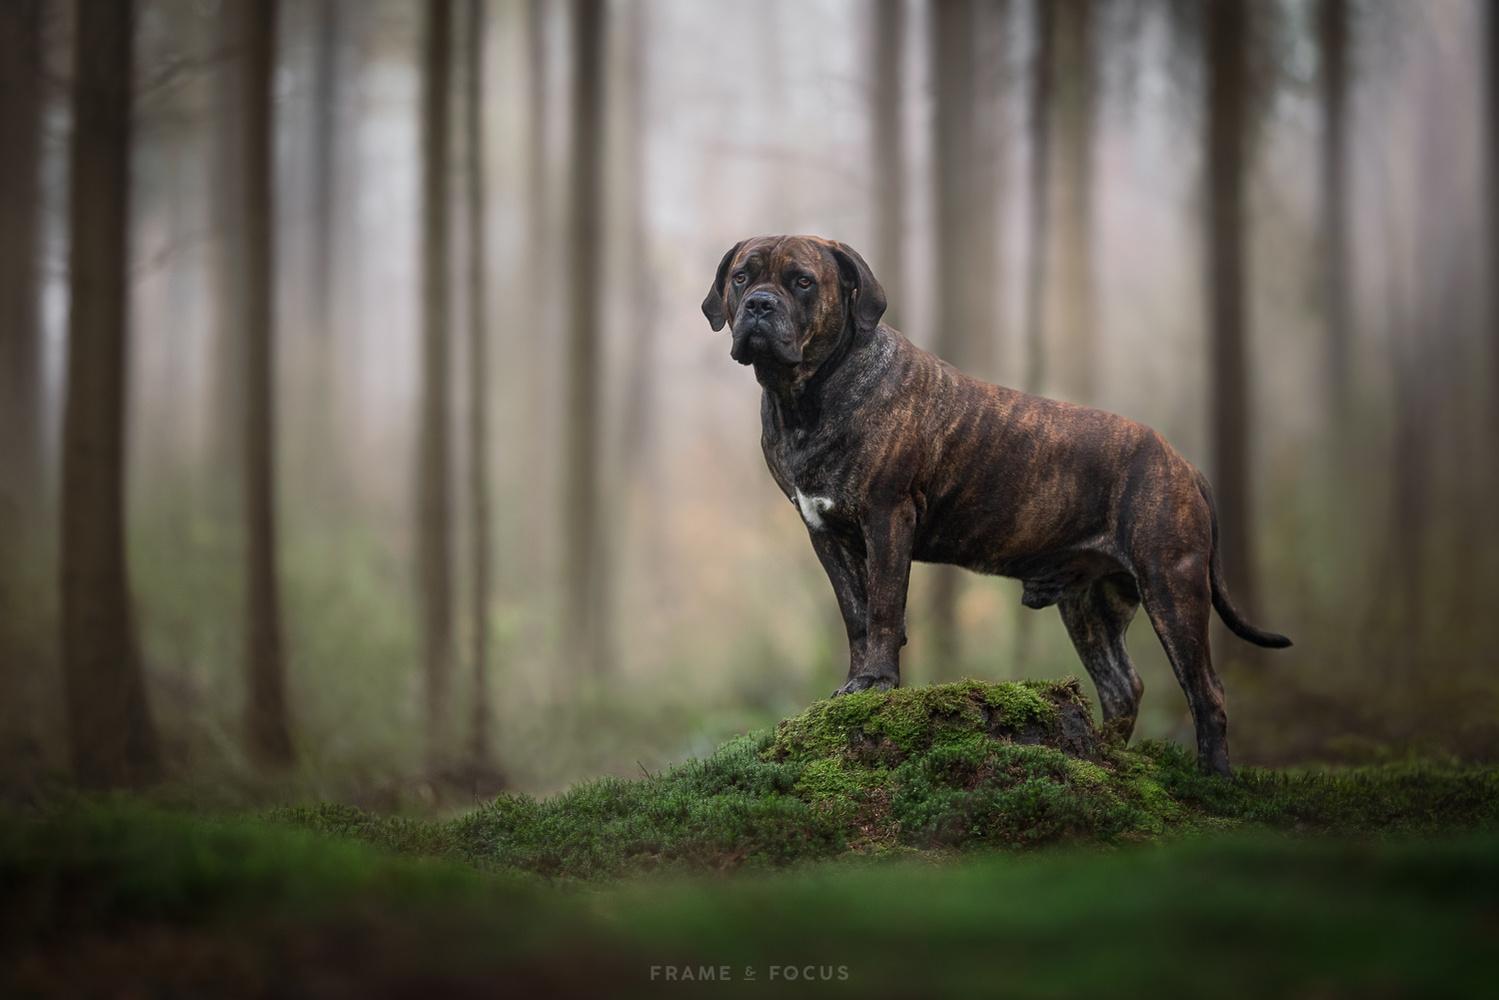 King of the moss by Marieke Kemp